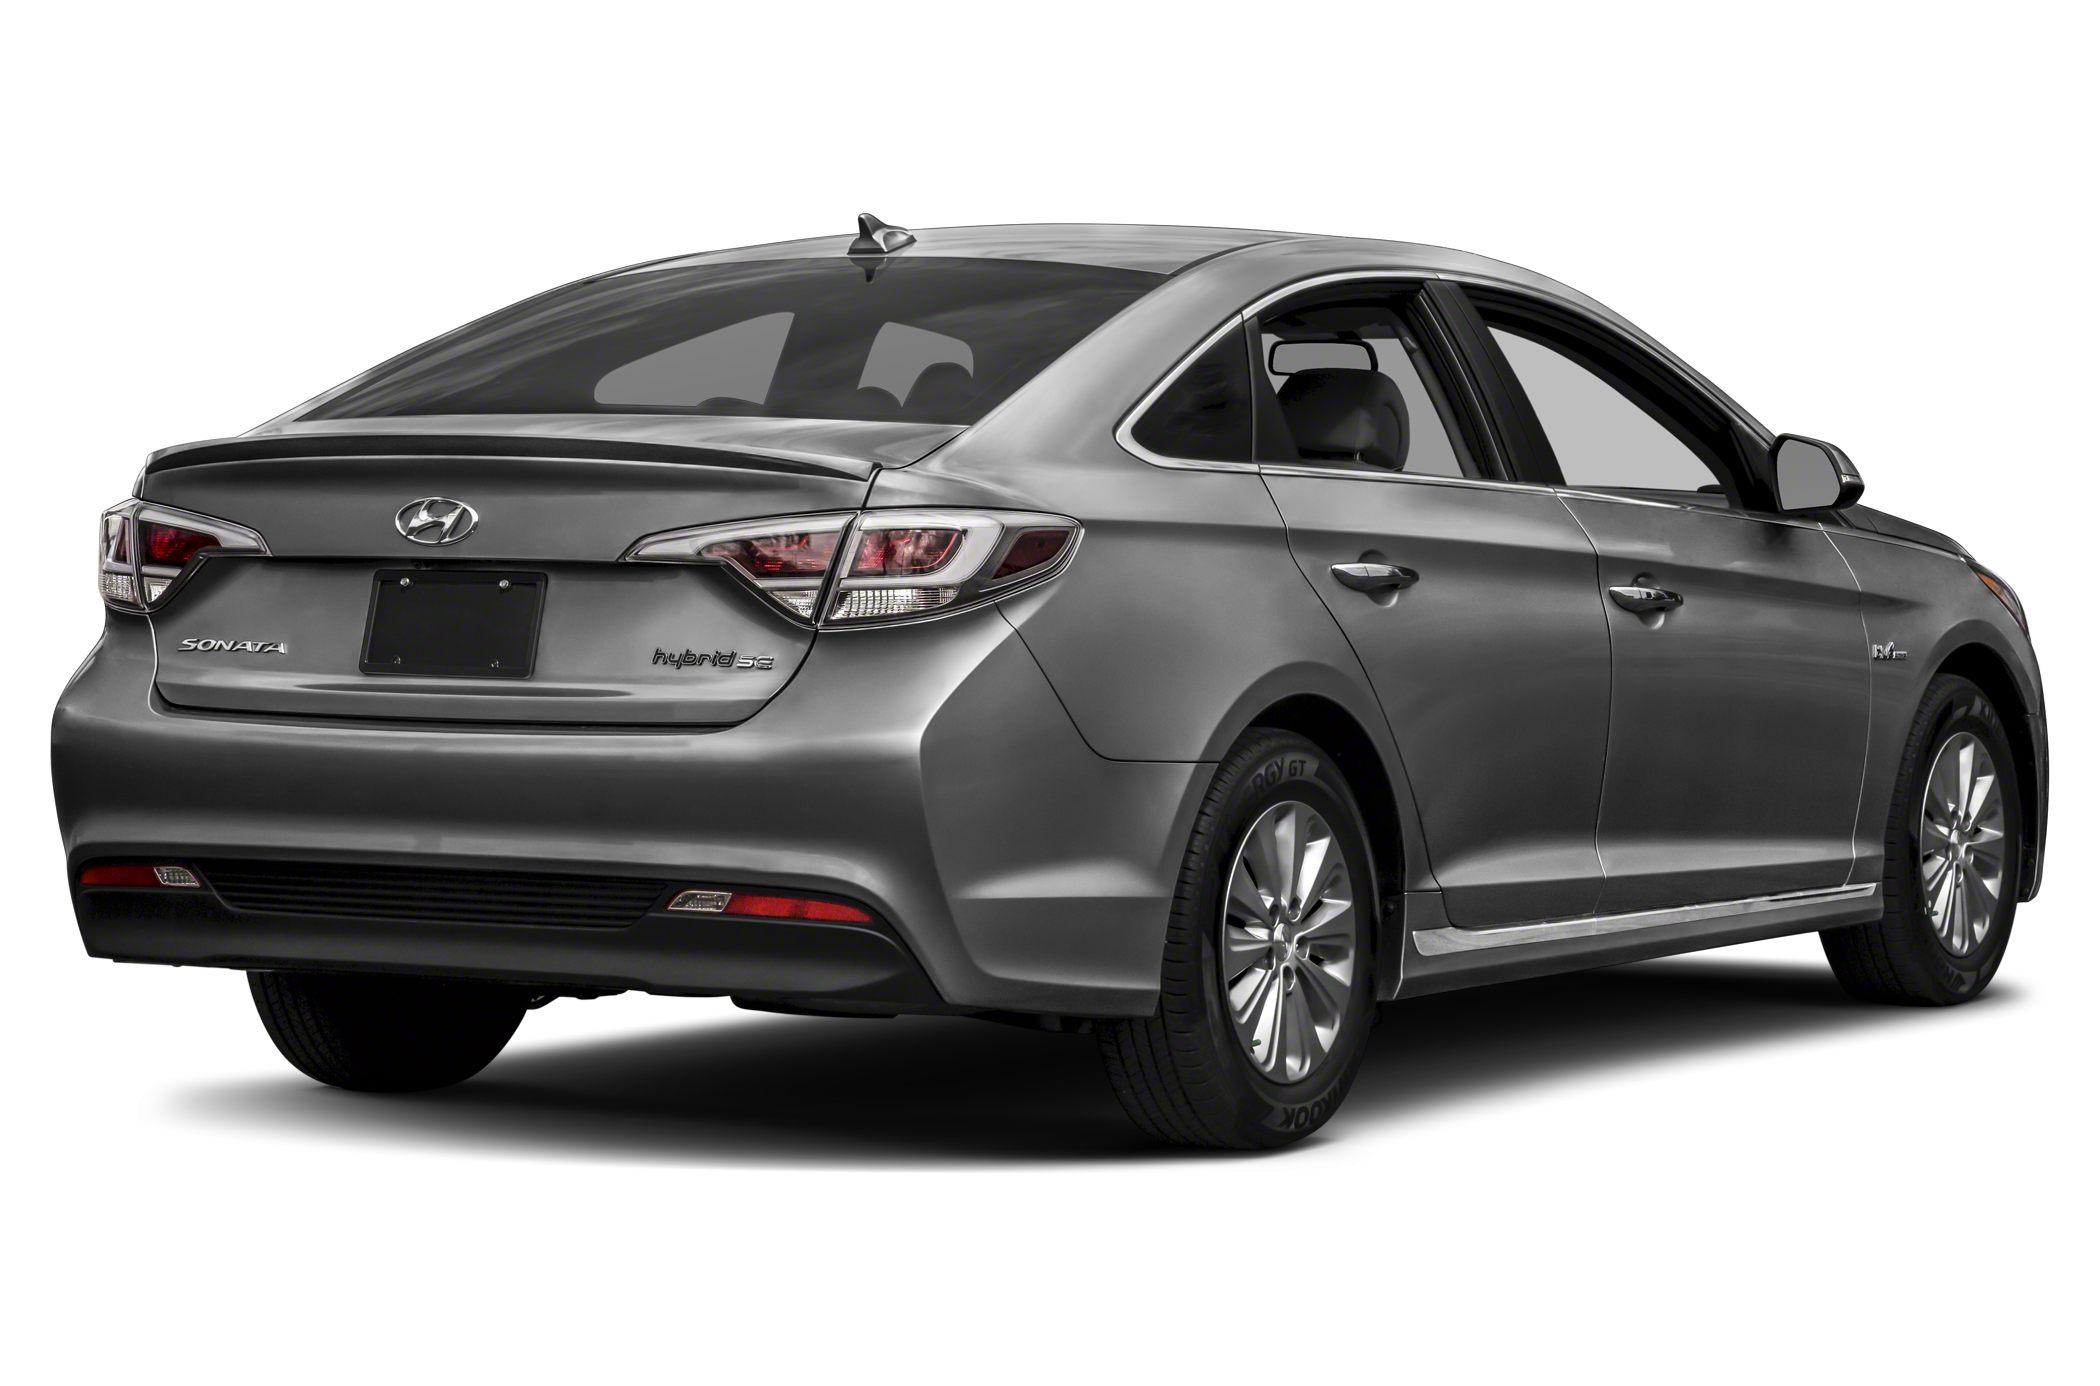 2017 Hyundai Sonata Hybrid Deals Prices Incentives